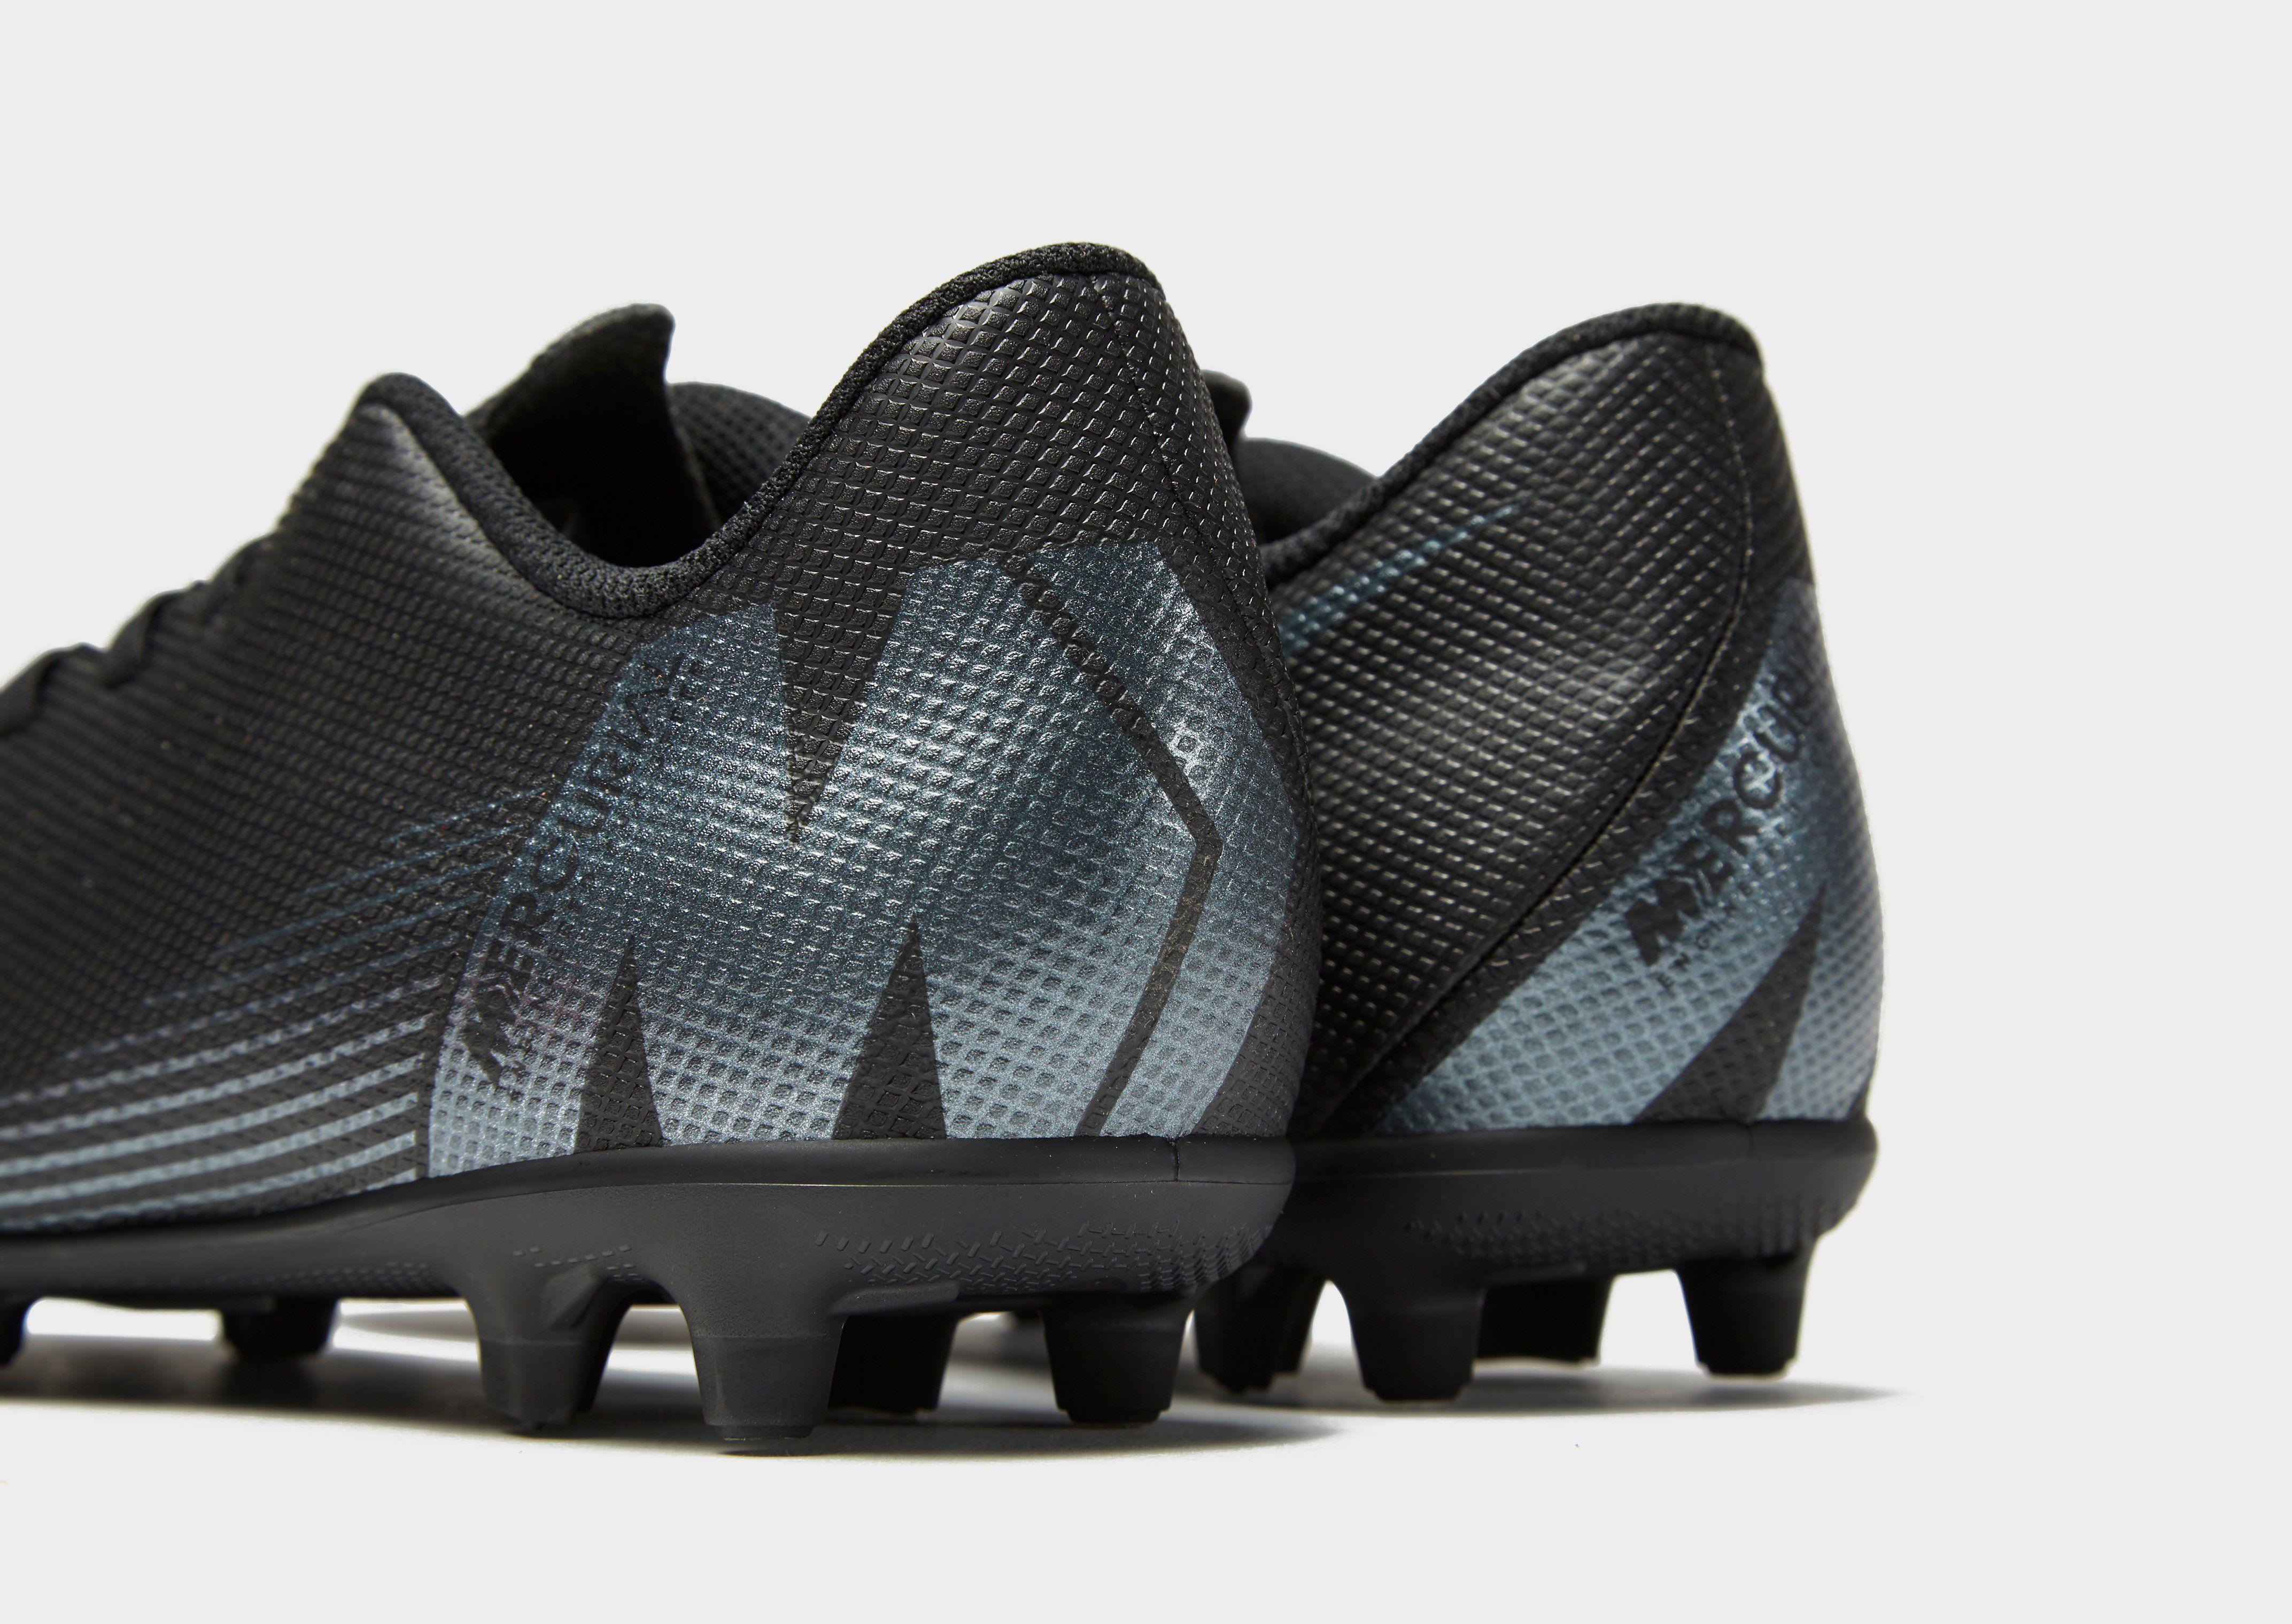 Nike Stealth Ops Mercurial Vapor MG Junior